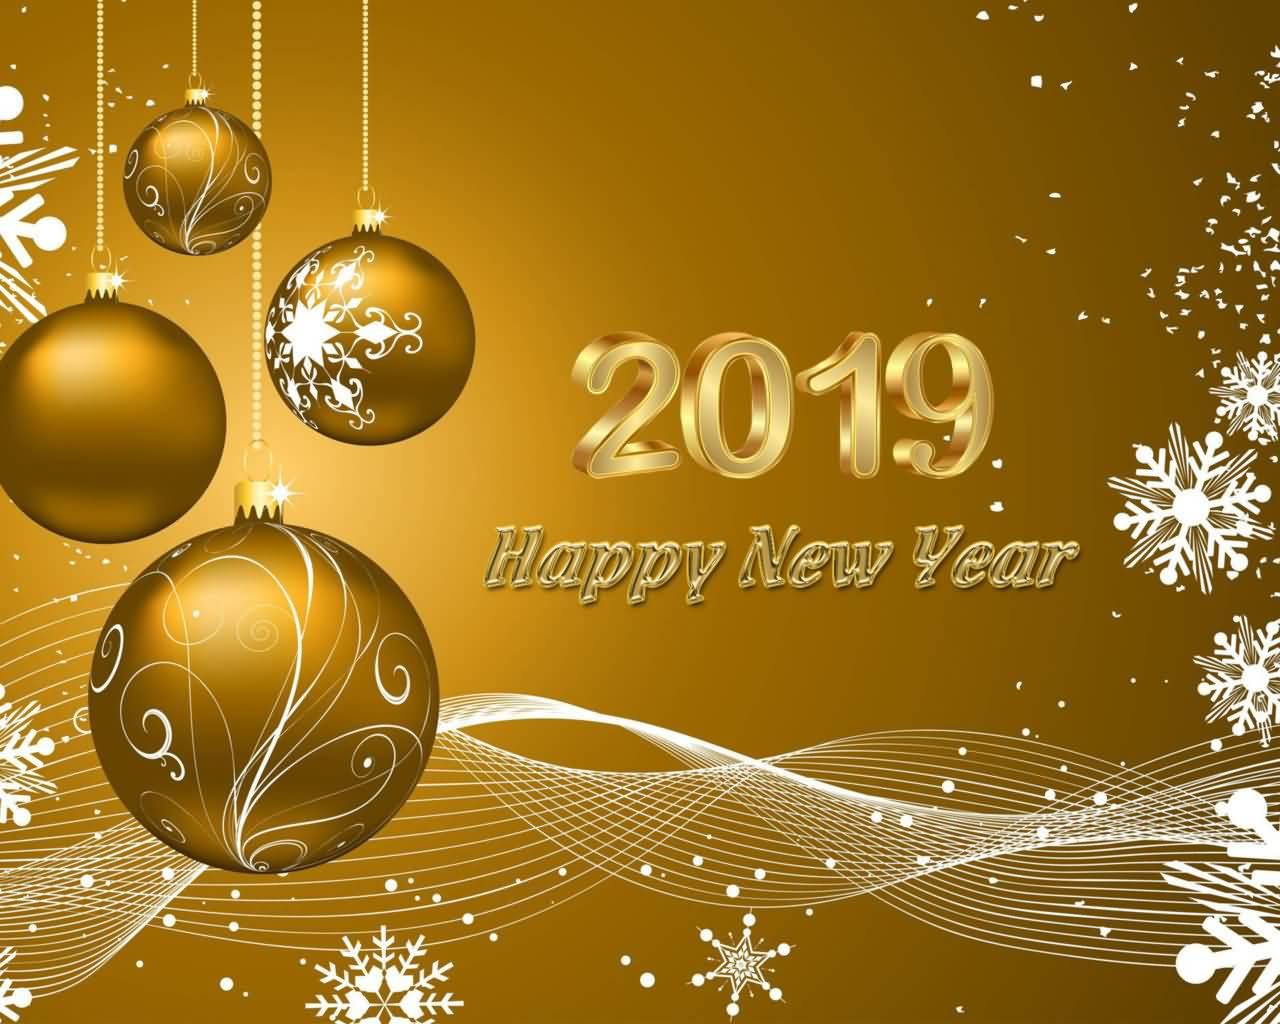 2019 Happy New Year Greeting